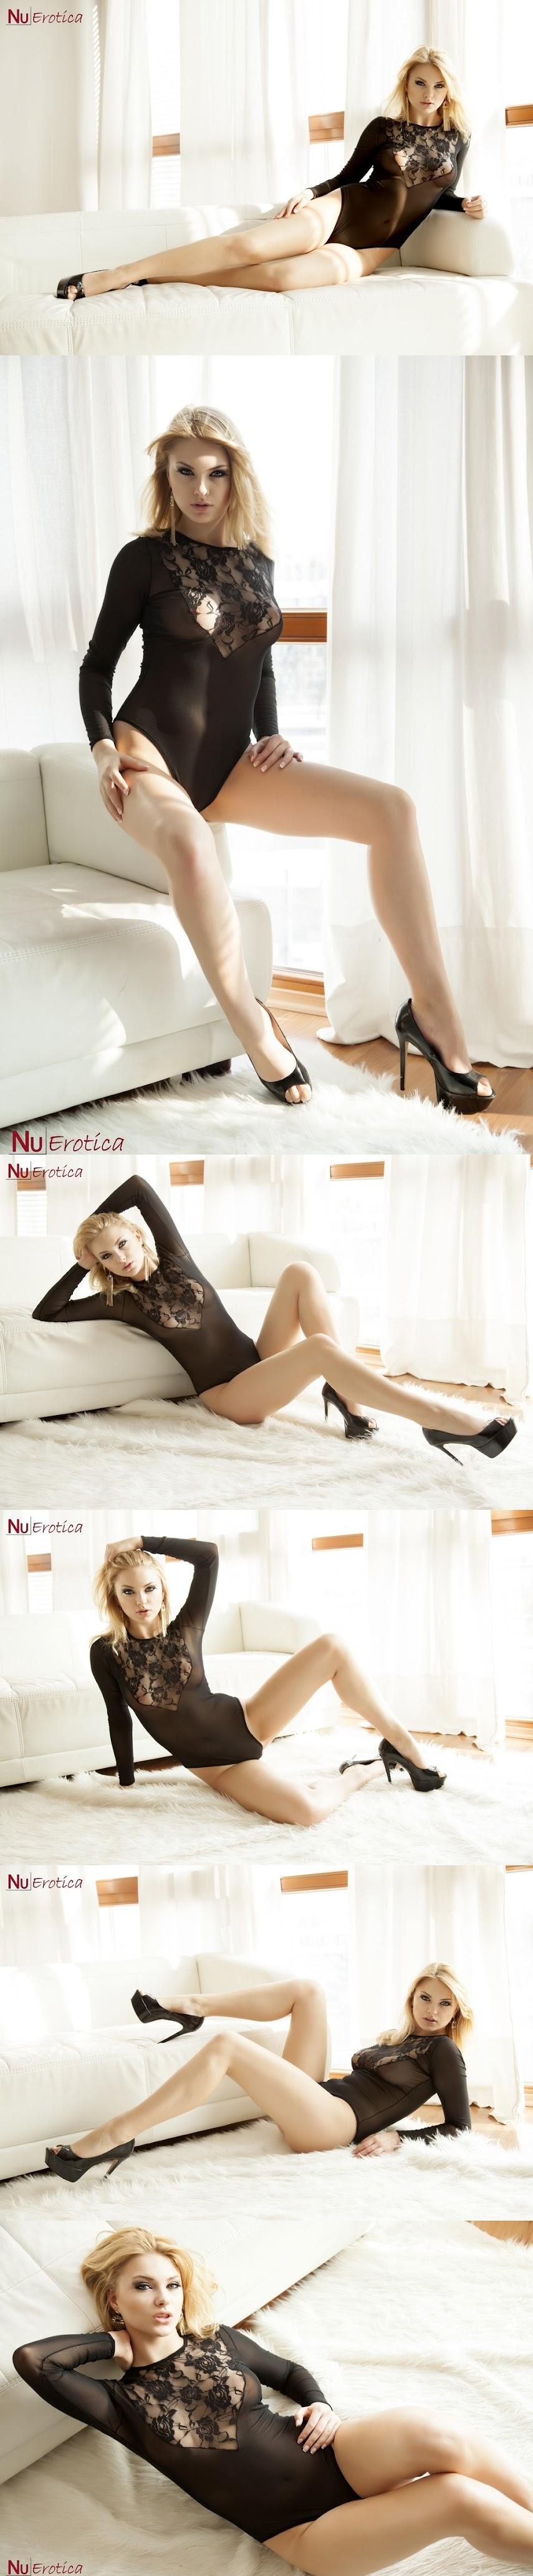 NuErotica 2015-08-11 Carla Sonre - Carla Sonre In Black LingerieReal Street Angels